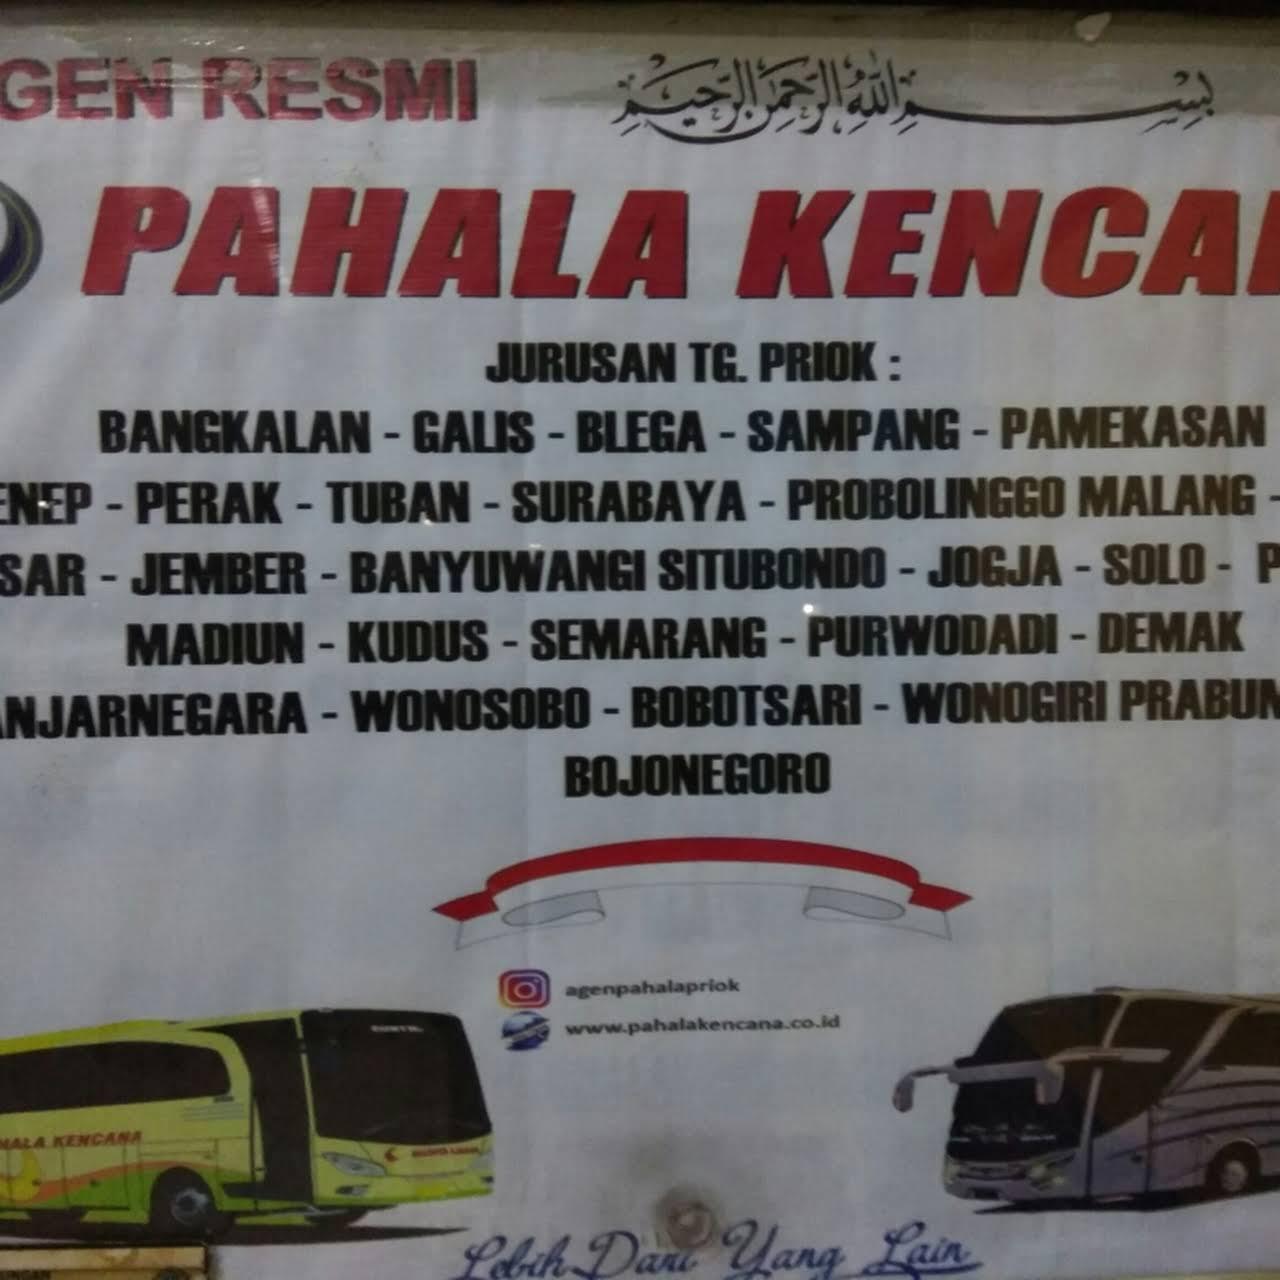 Agen Pahala Kencana Terminal Tj Priok Agen Tiket Bus